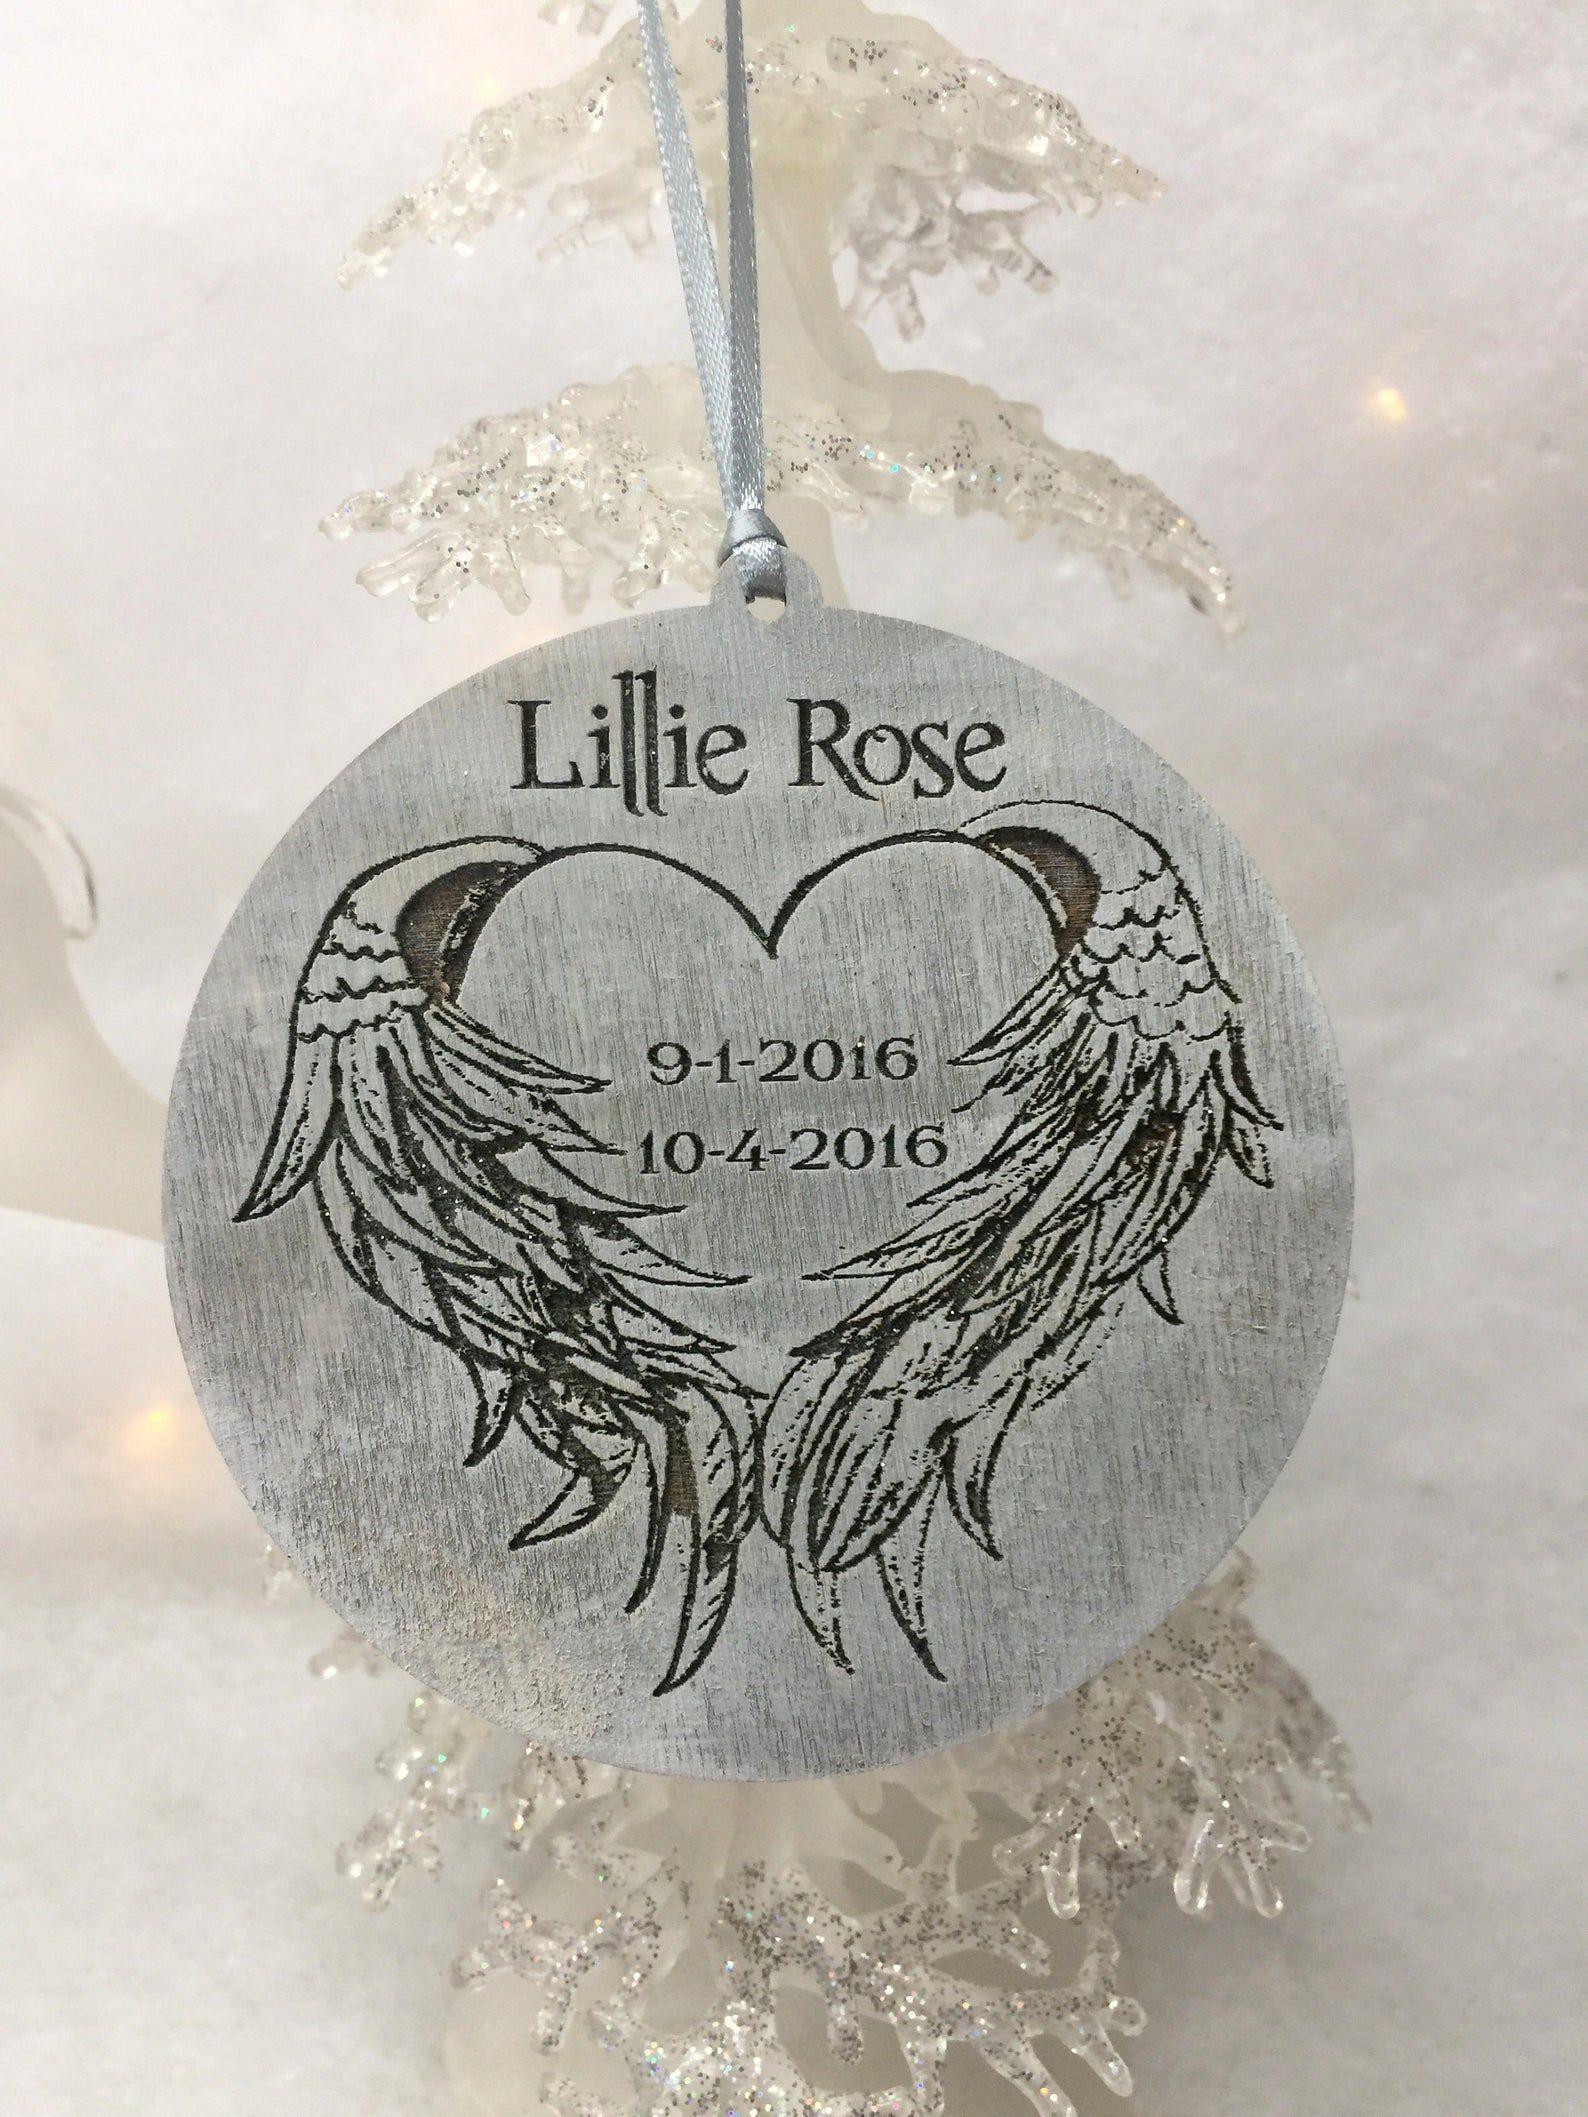 Memory Ornament Christmas Ornament Baby Memorial Ornament Etsy In 2020 Memorial Ornaments Christmas Ornaments Baby Ornaments